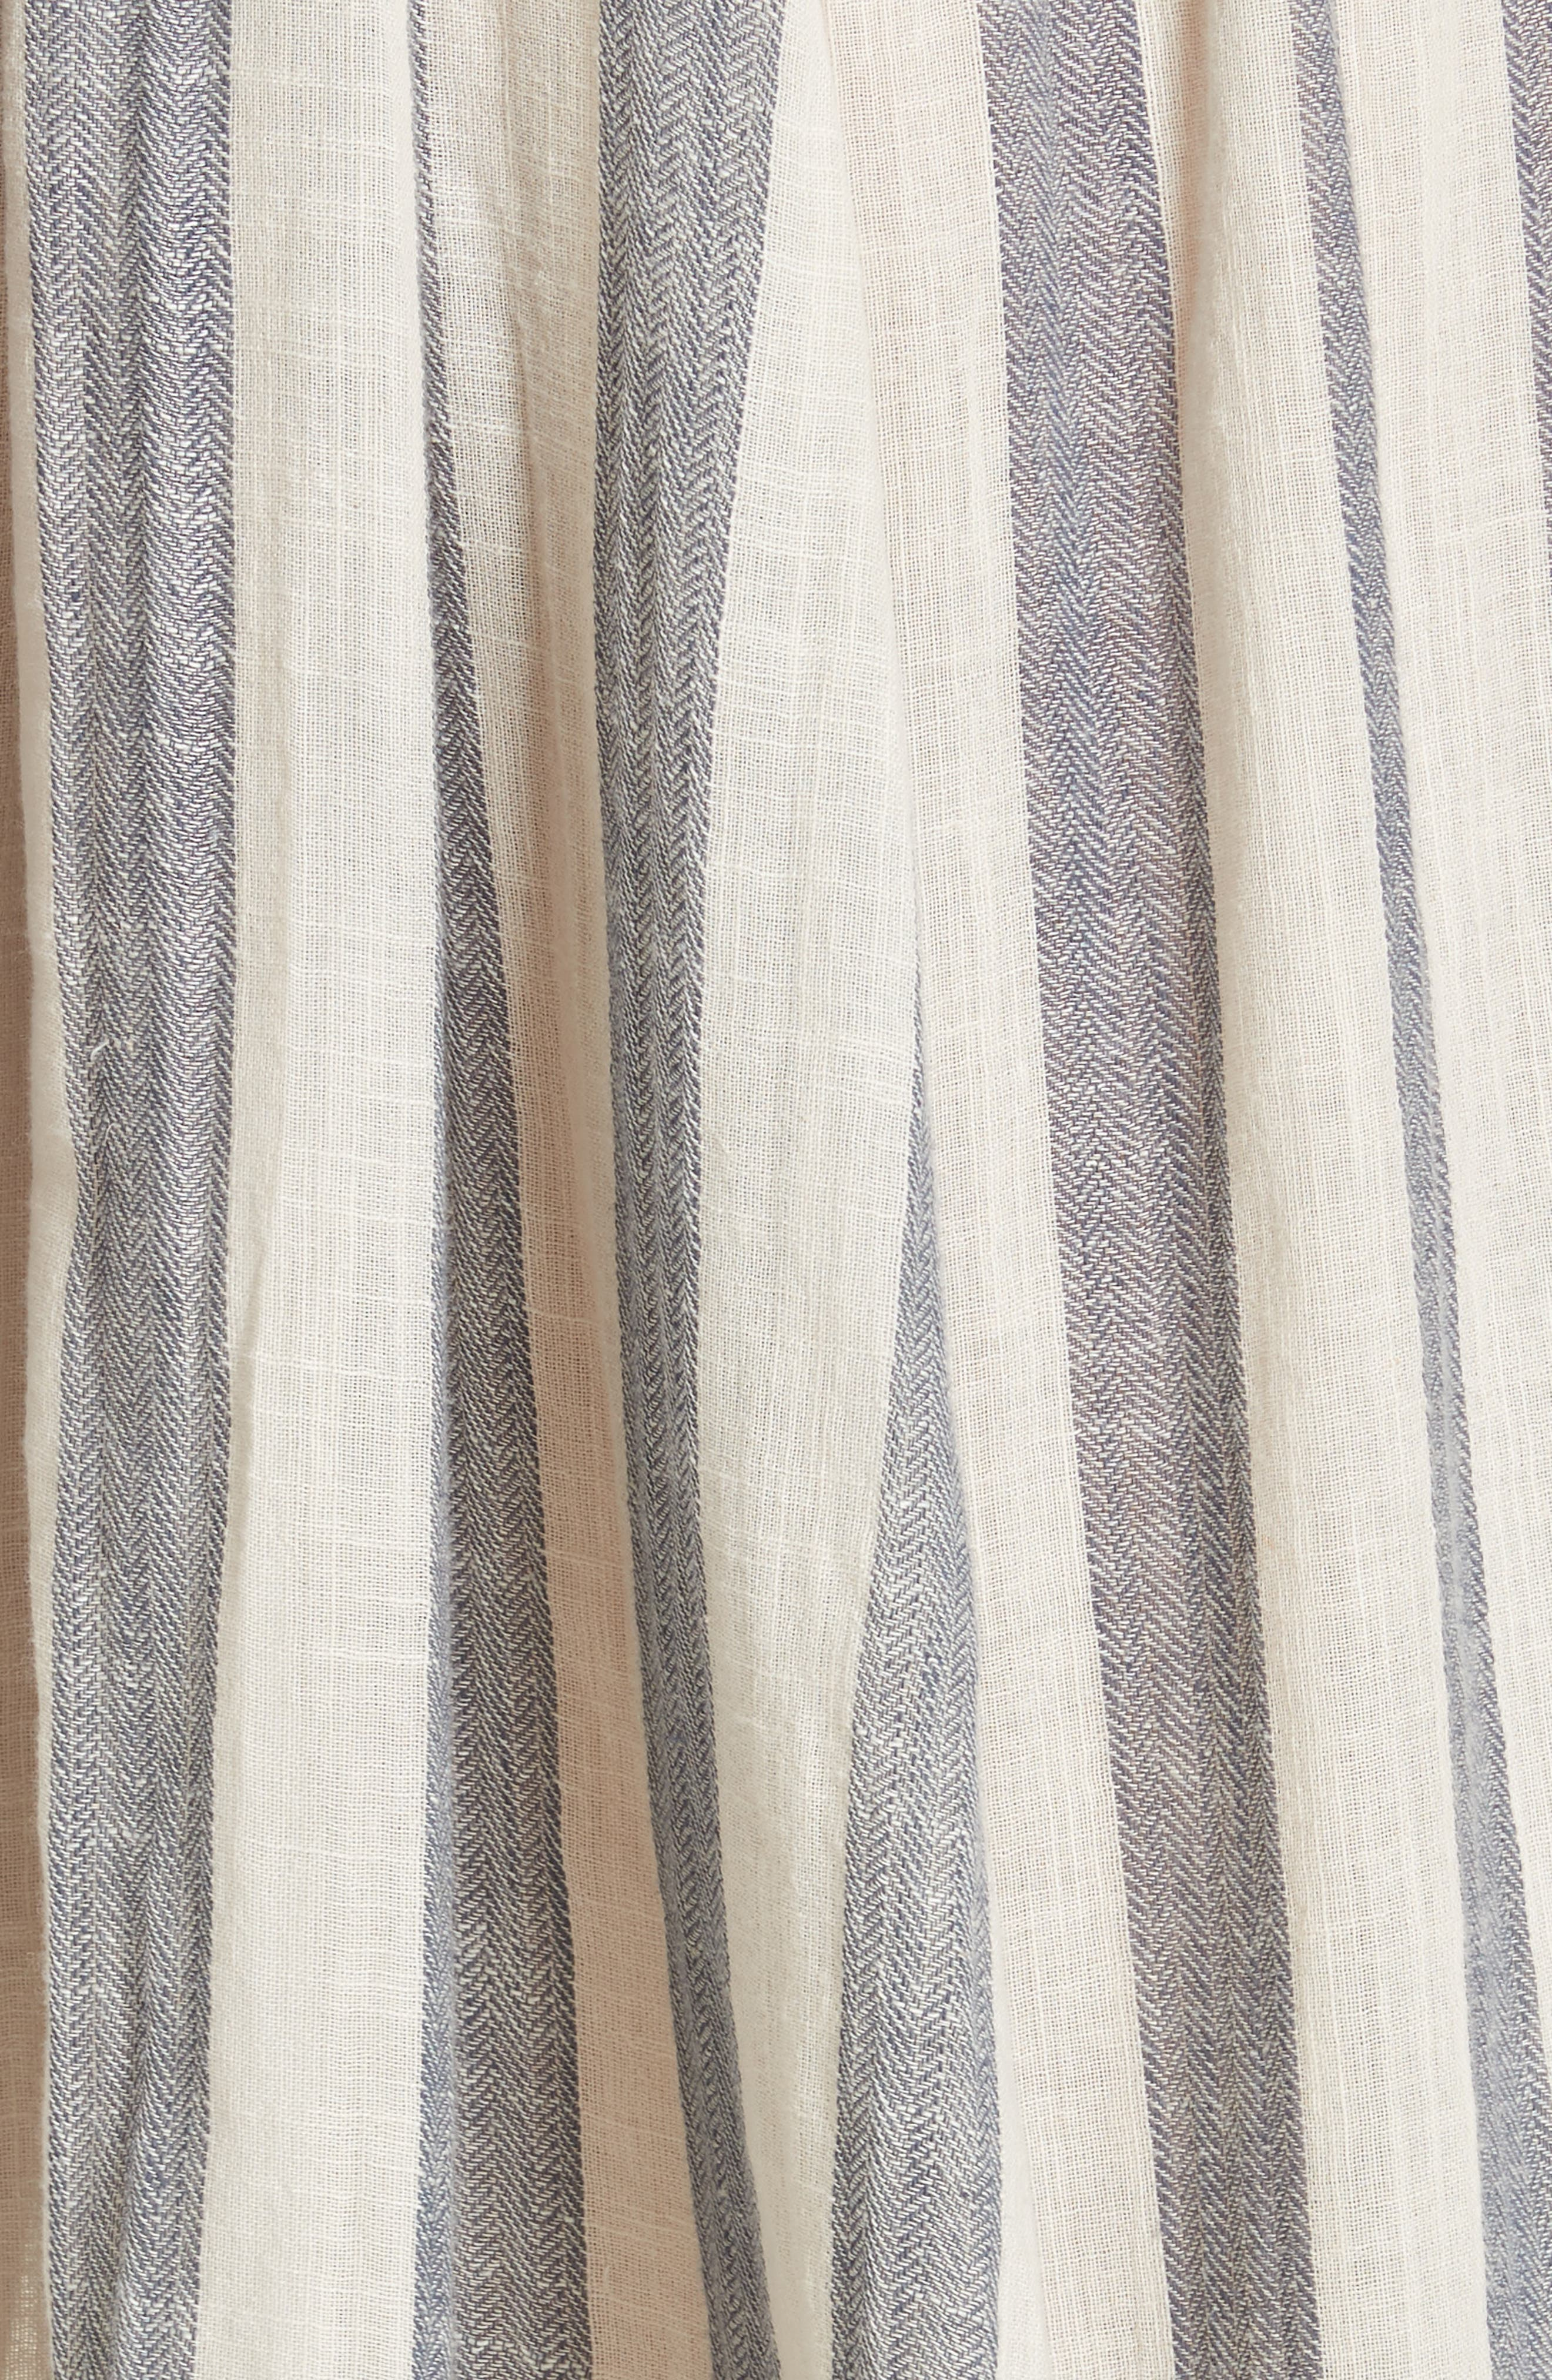 Stripe Me Up Strapless Midi Dress,                             Alternate thumbnail 9, color,